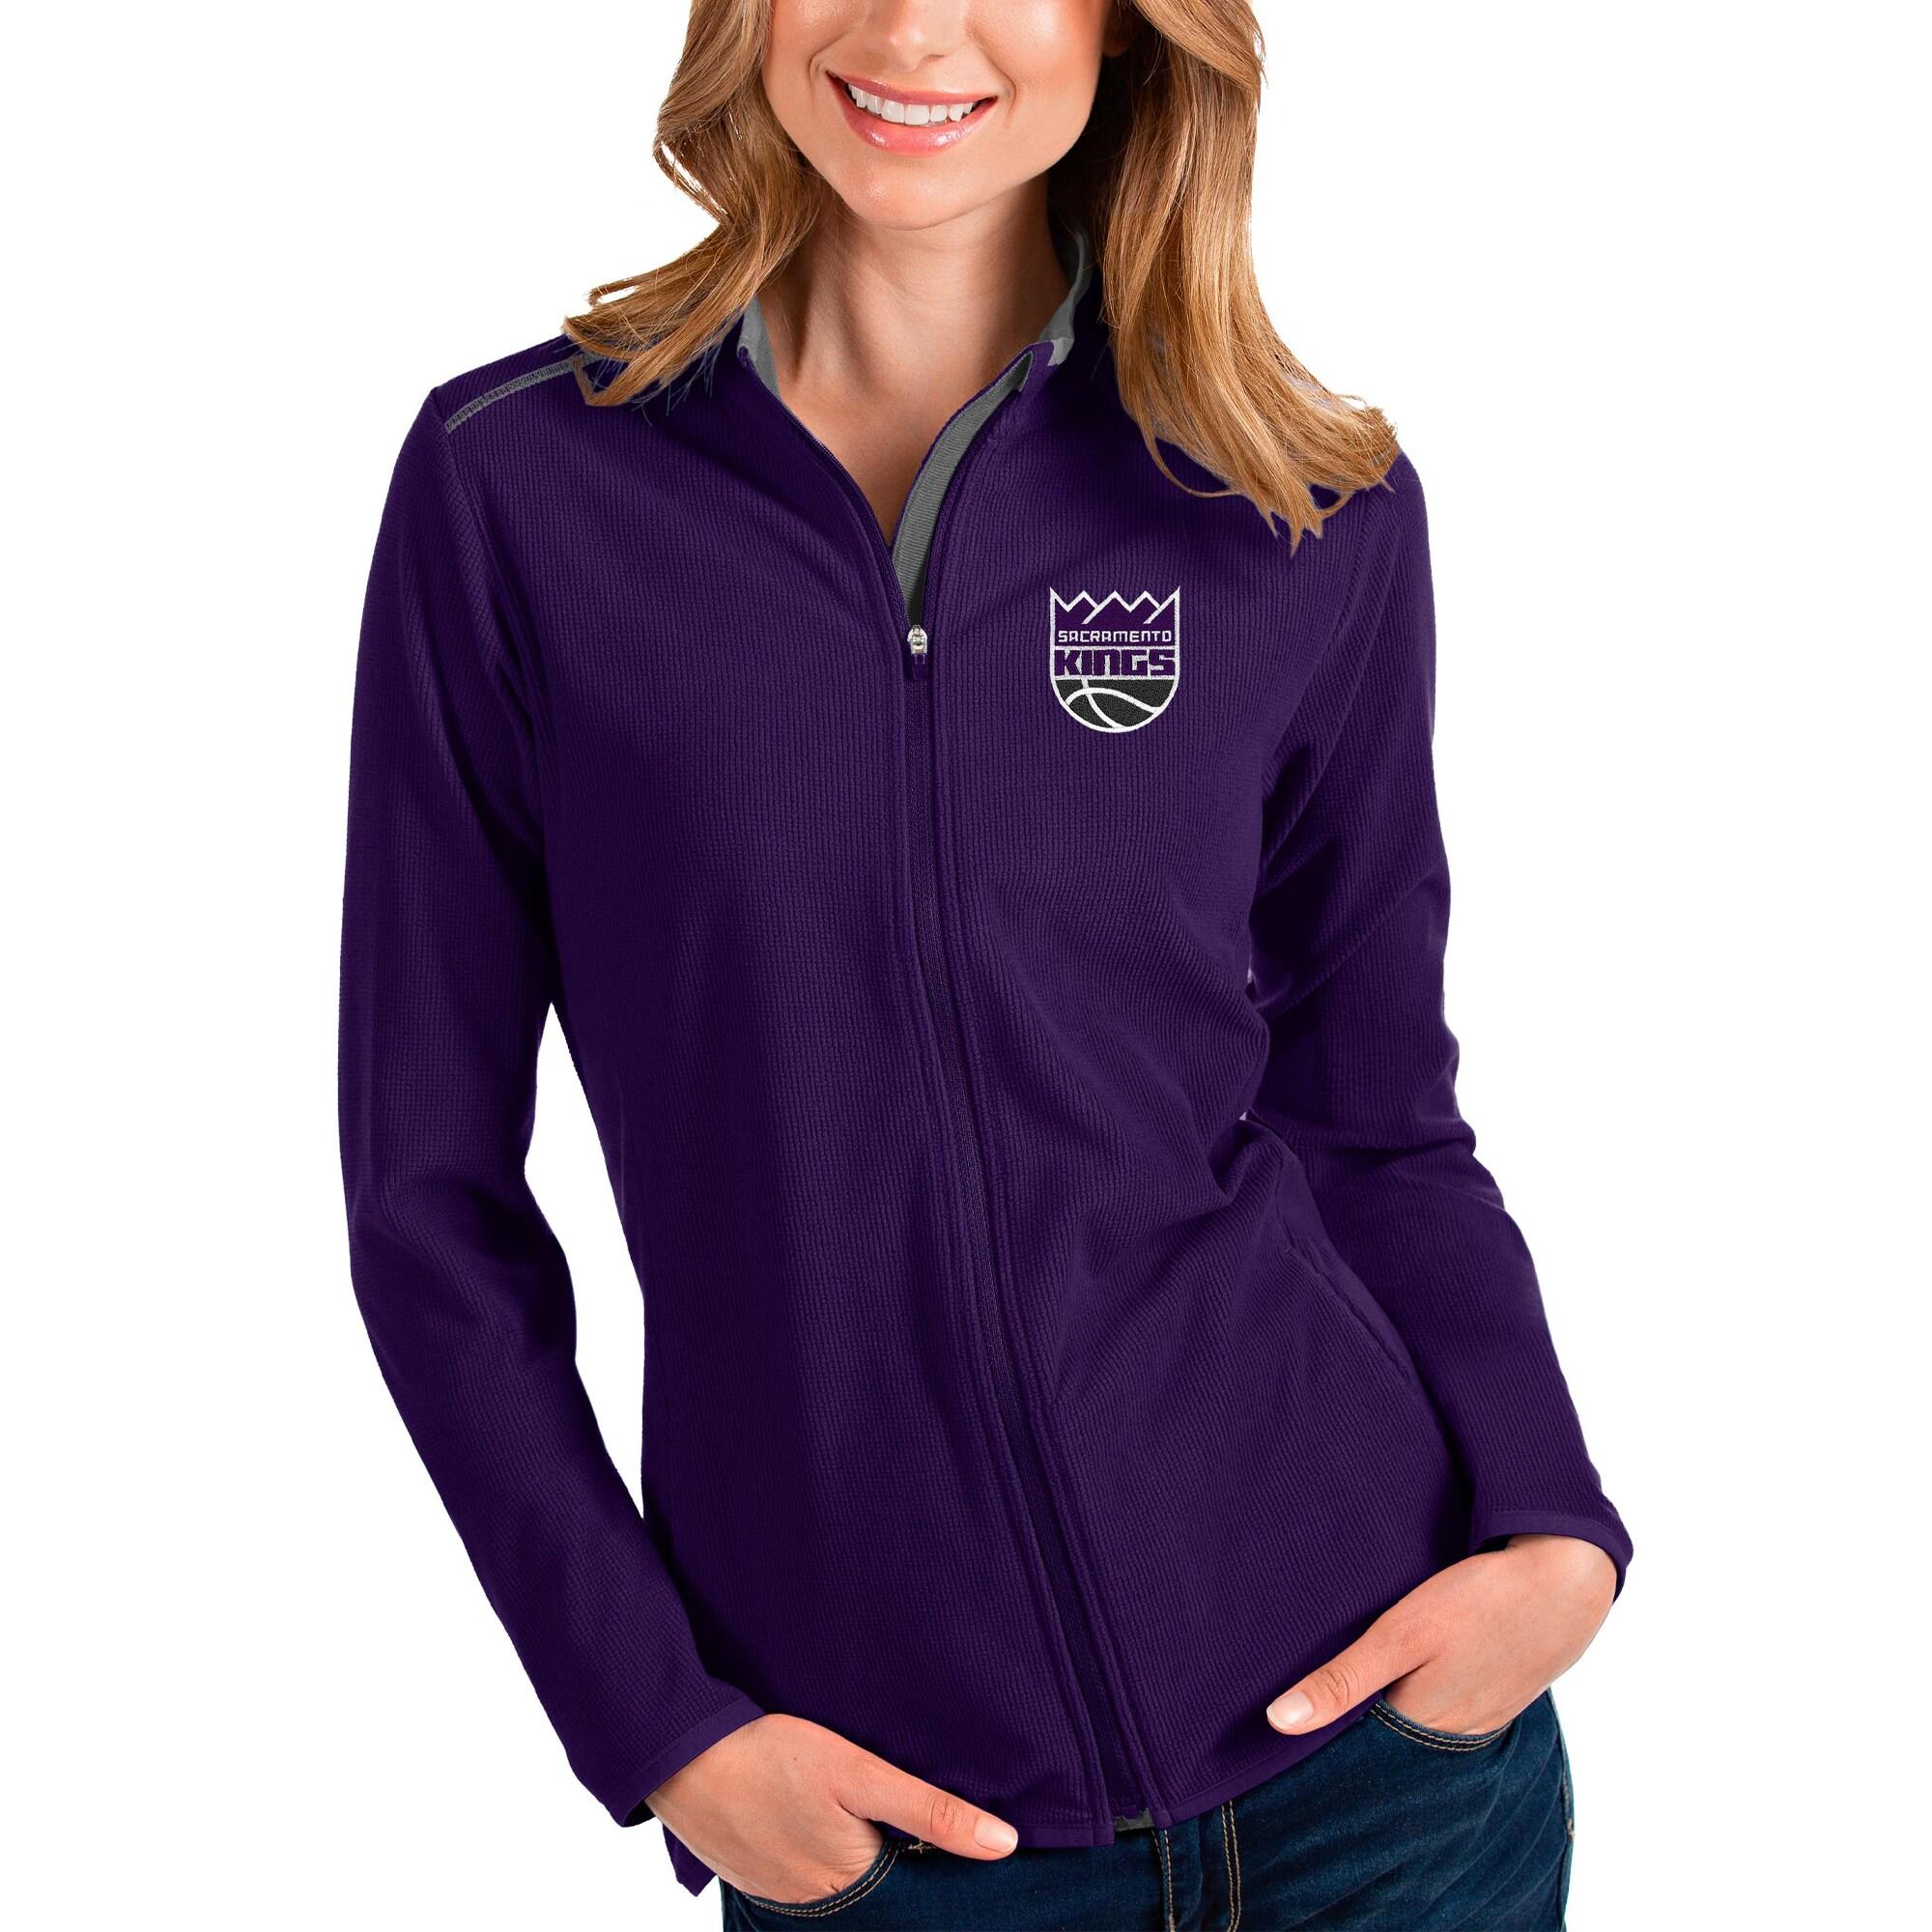 Sacramento Kings Antigua Women's Glacier Full-Zip Jacket - Purple/Gray